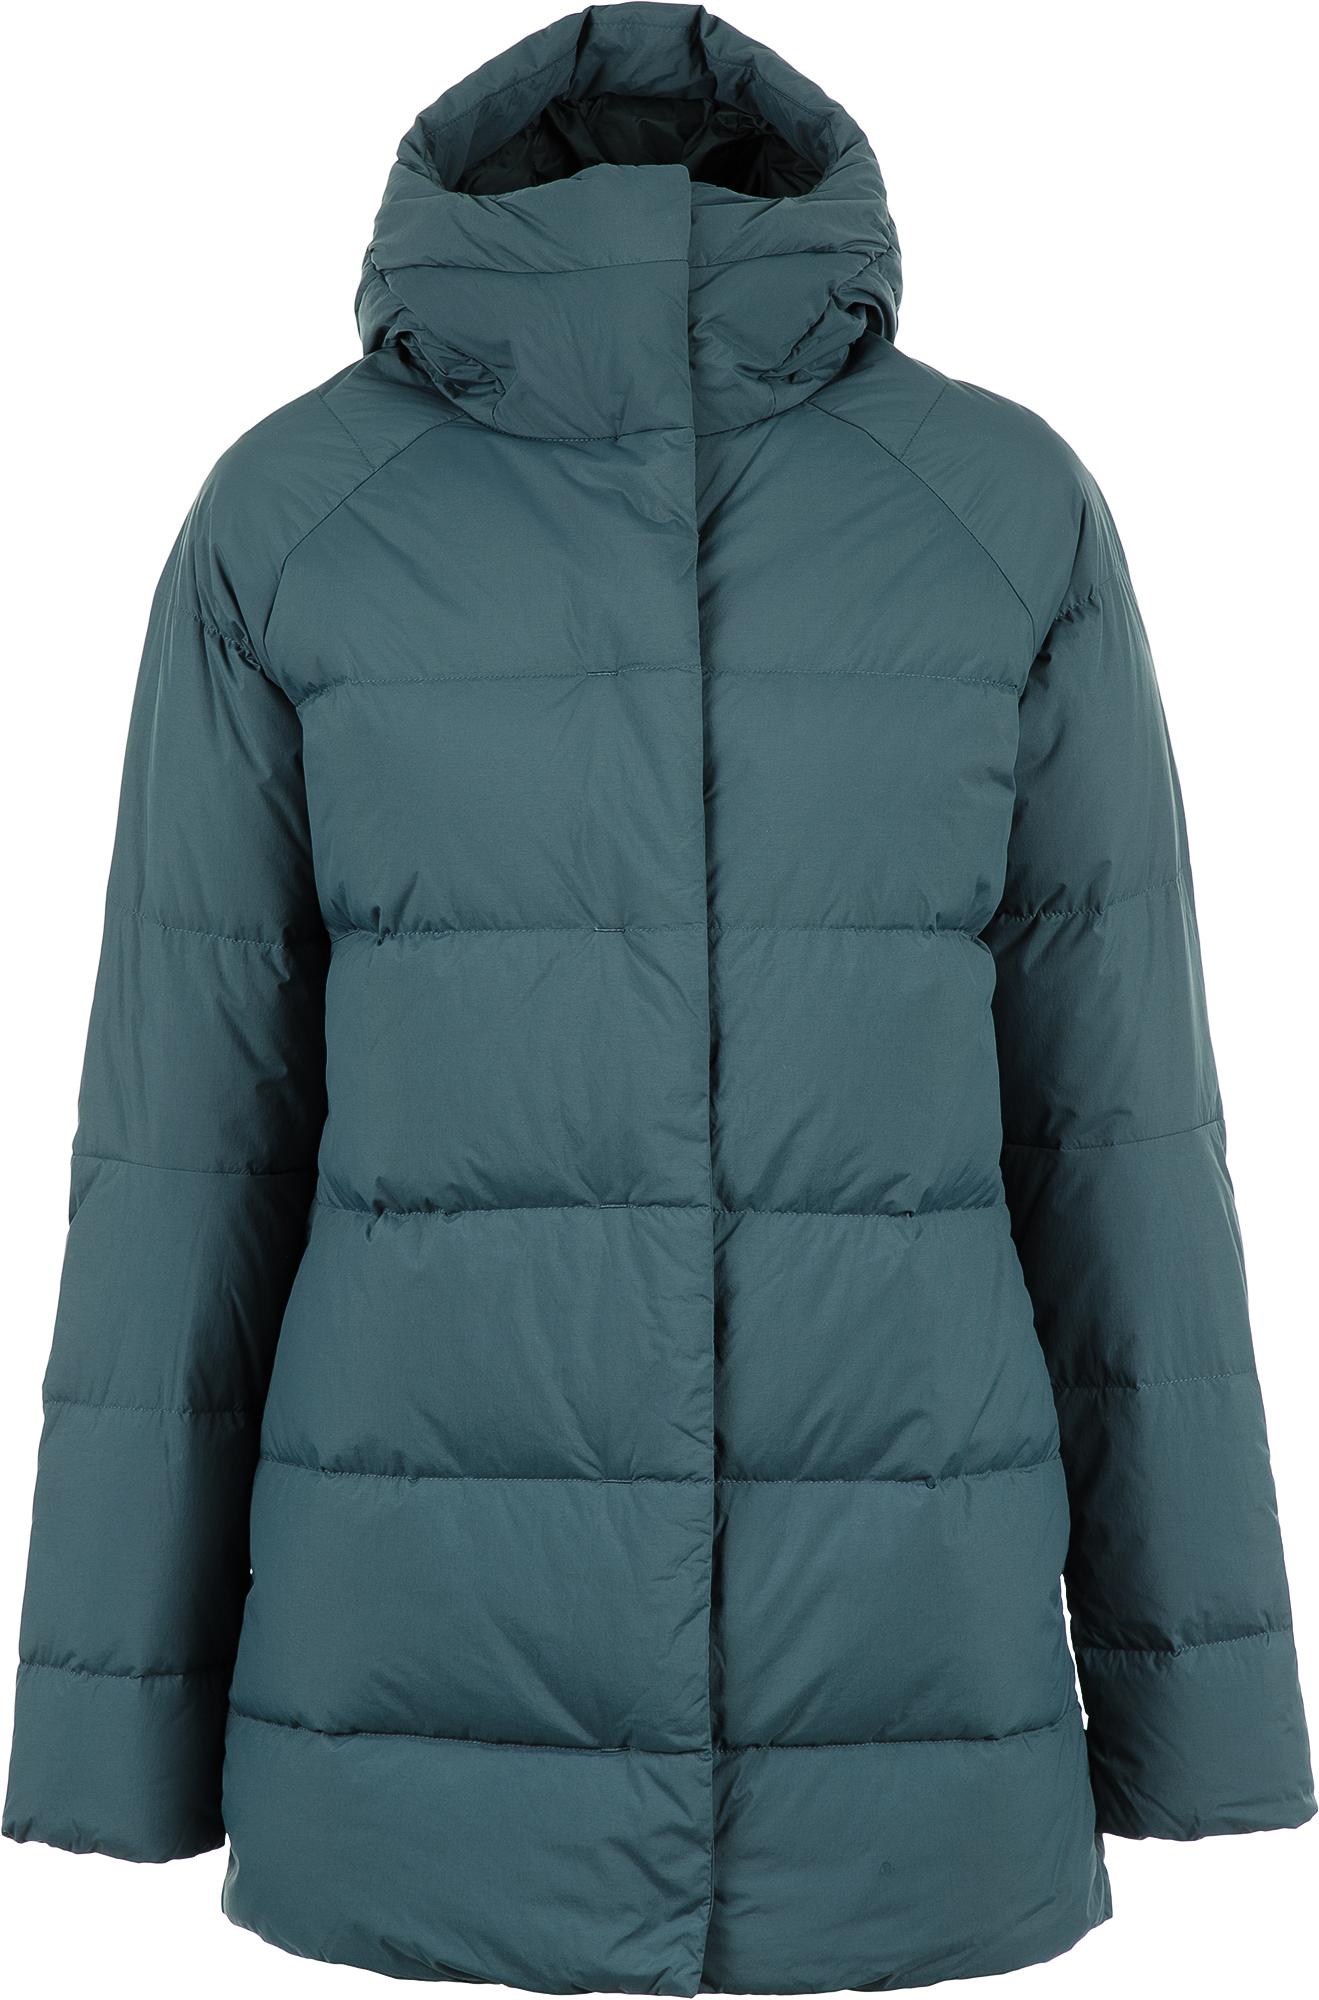 Mountain Hardwear Куртка пуховая женская Mountain Hardwear Glacial Storm™, размер 50 цена